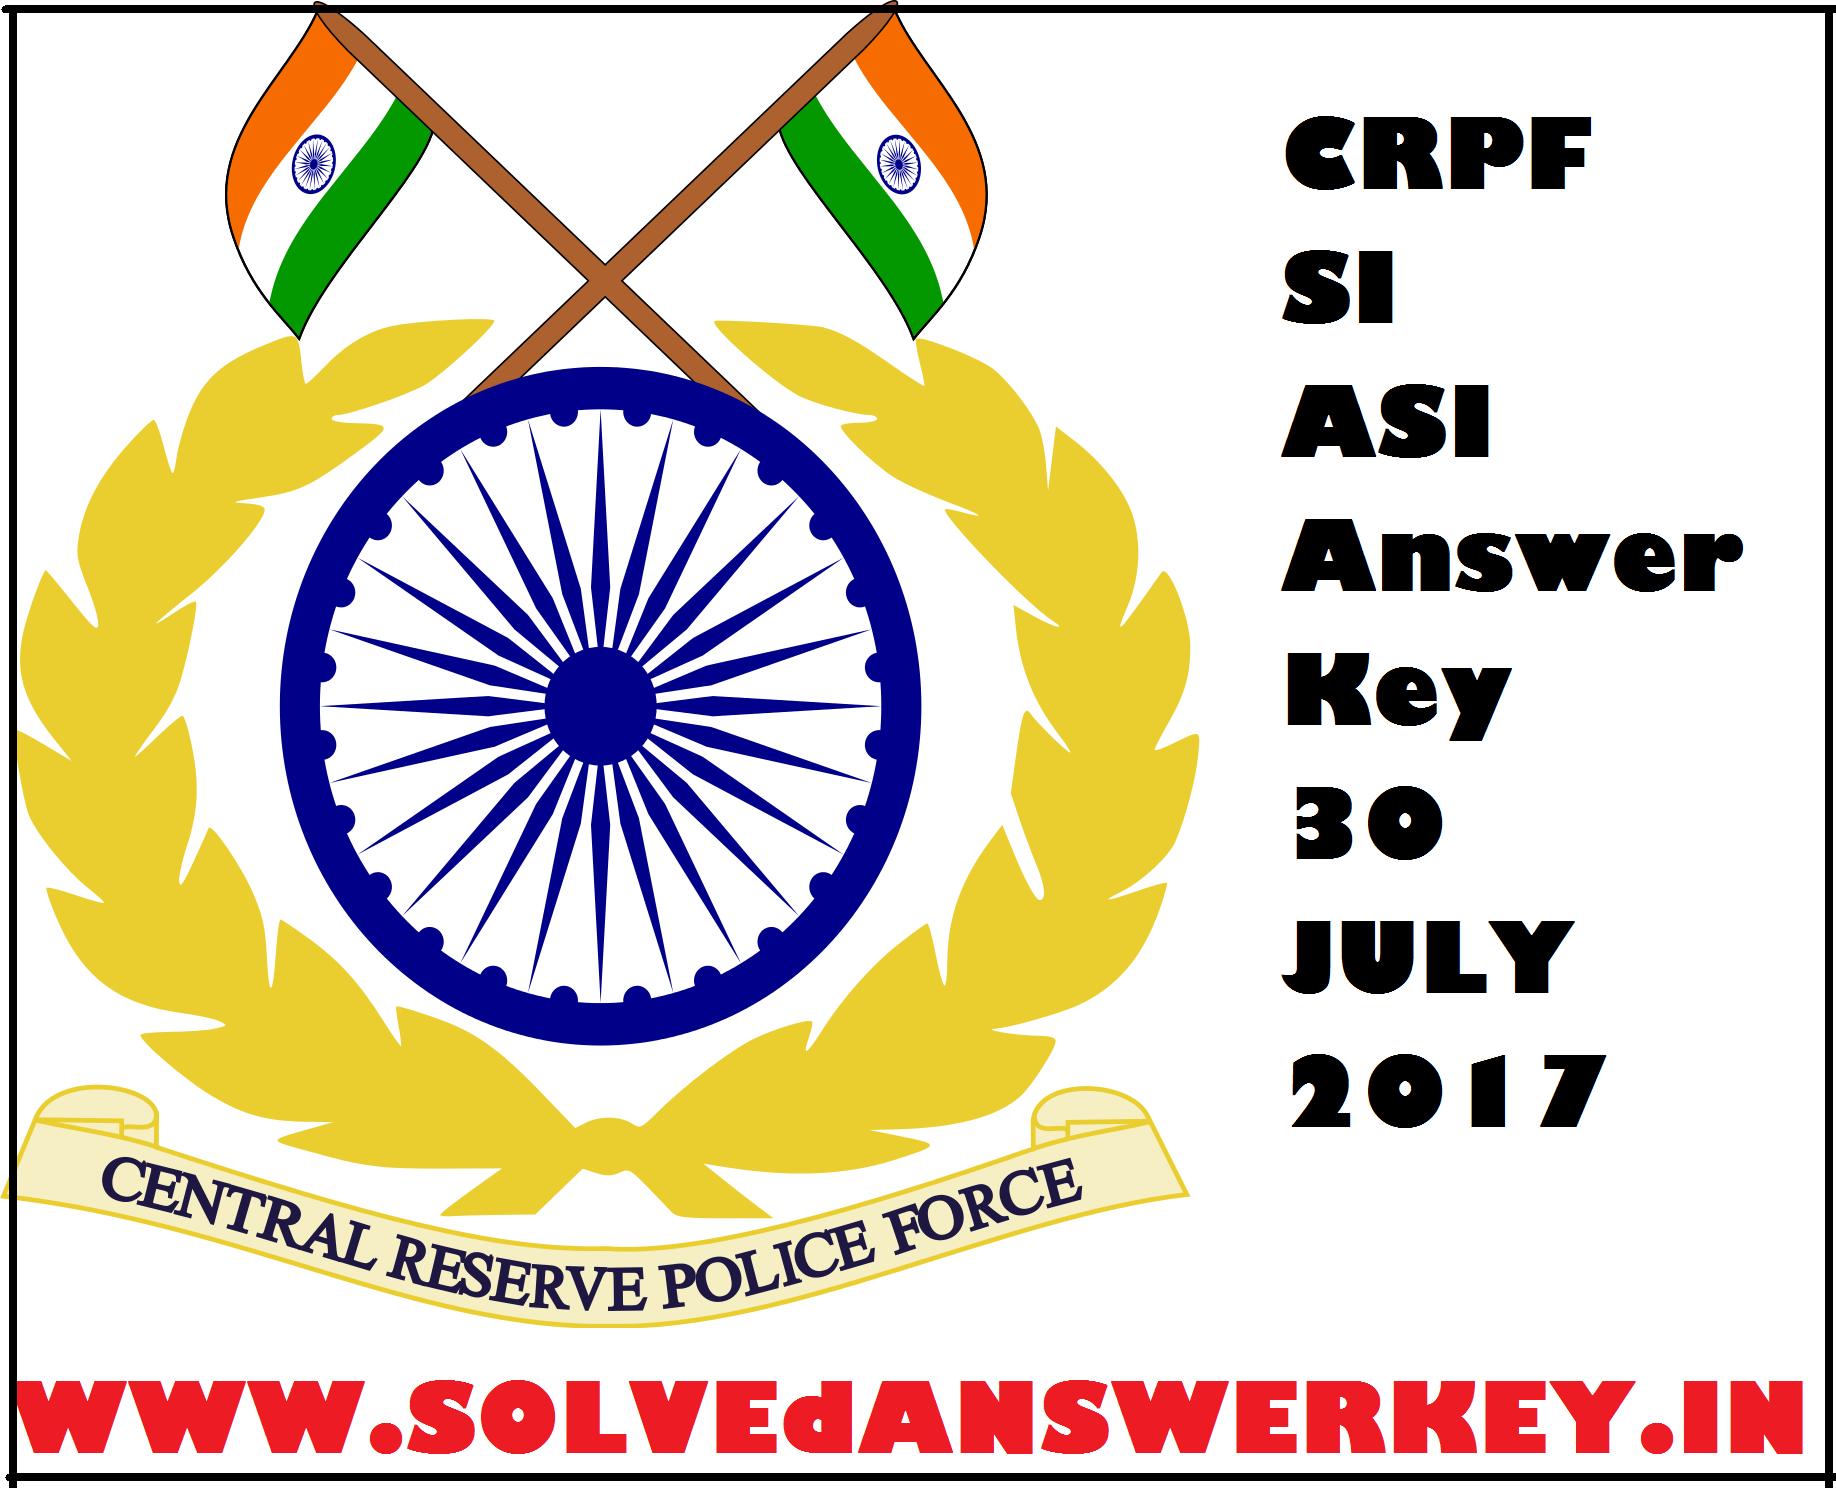 CRPF SI ASI Answer Key 2017 PDF Download